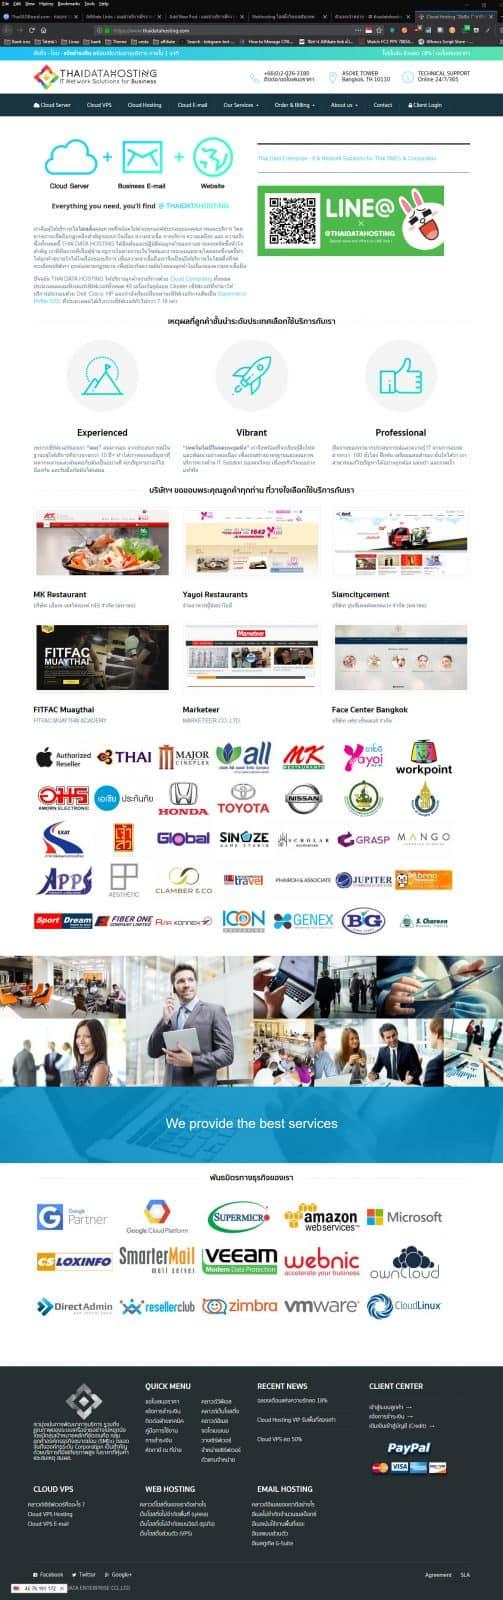 THAIDATAHOSTING, THAIDATAHOSTING อีกหนึ่งผู้ให้การยอดเยี่ยม, Review All Online Product Update 2019